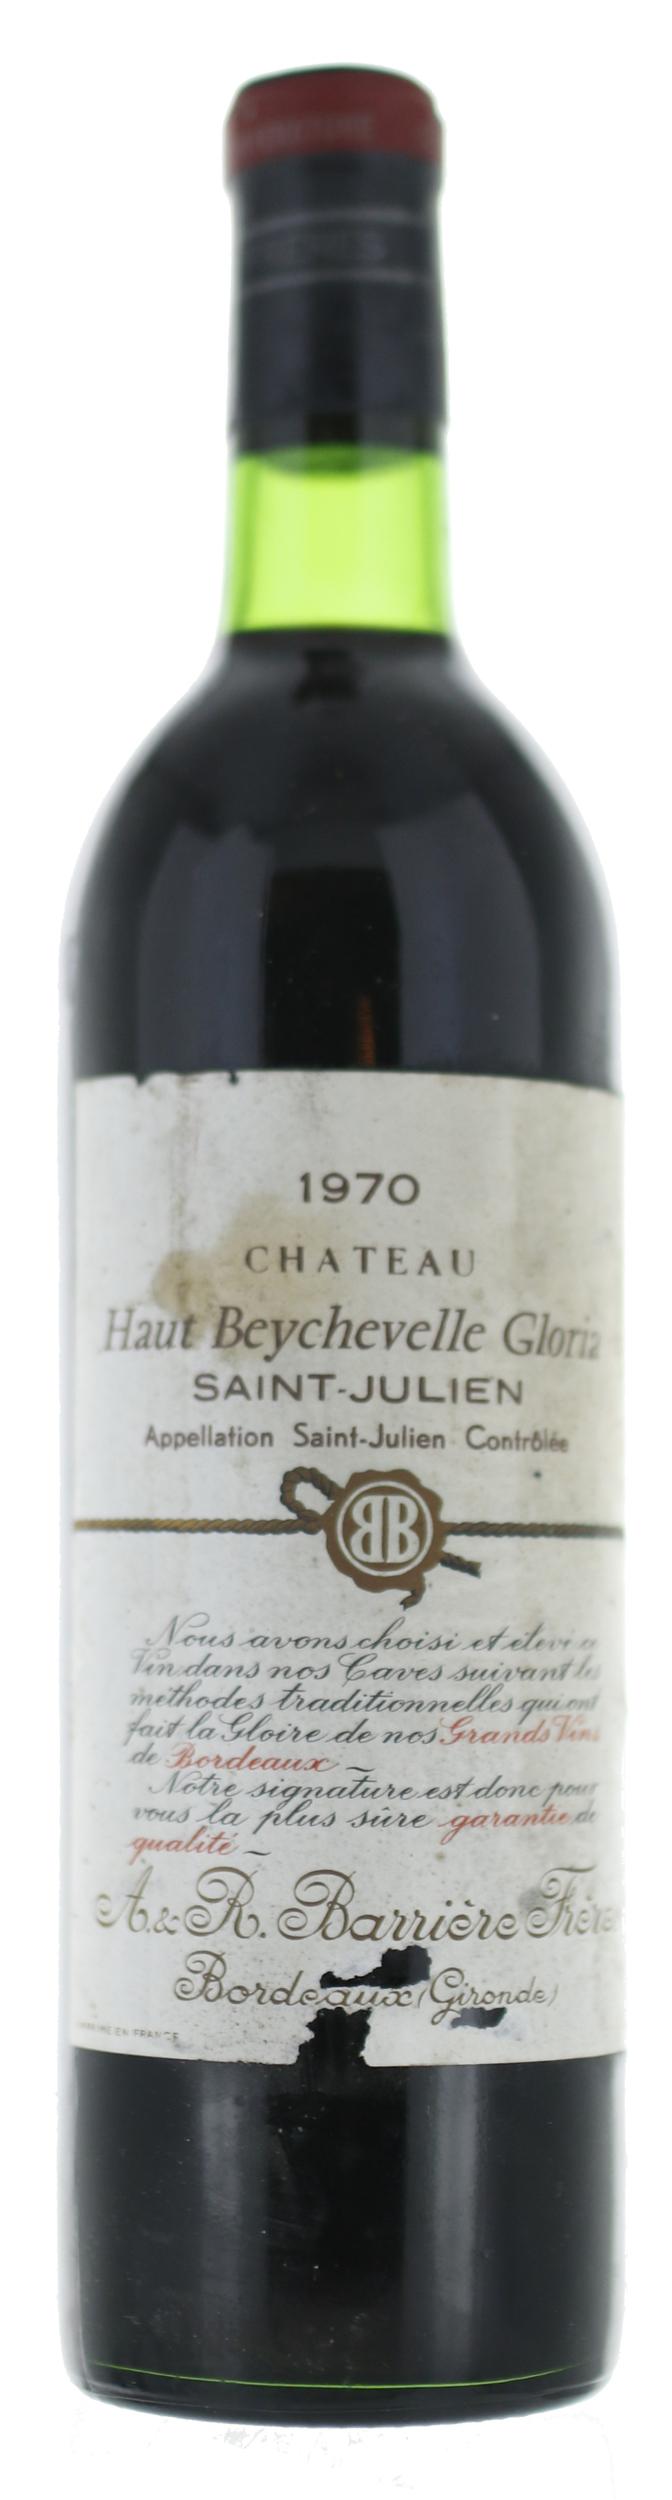 Saint Julien - Château Haut Beychevelle Gloria - 1970